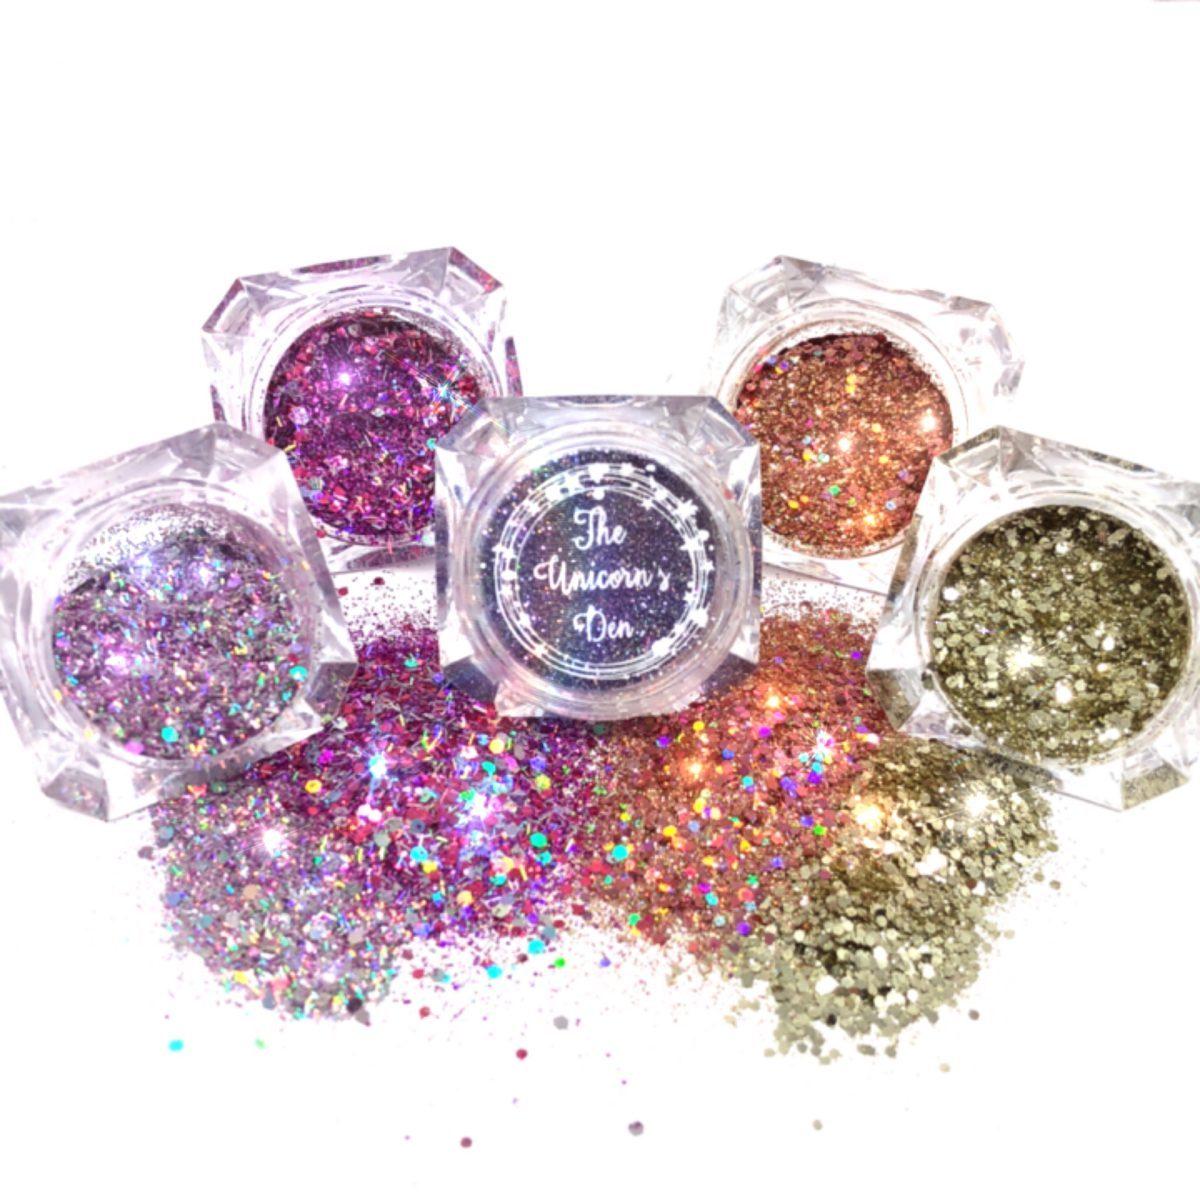 Glitter-stock-image